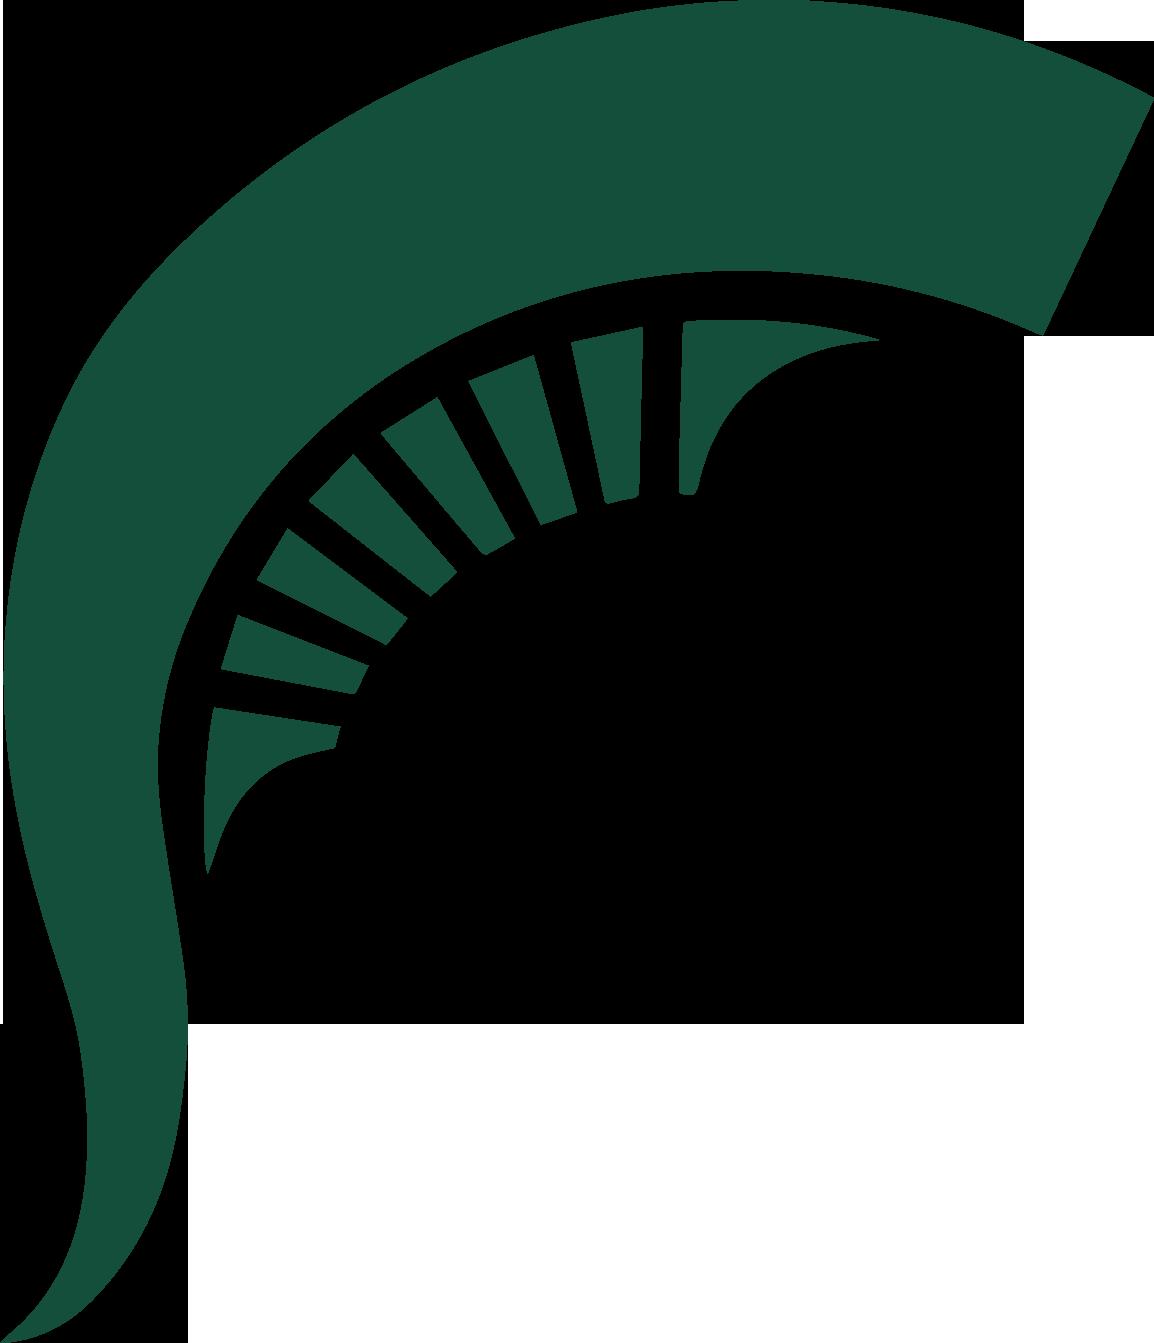 Spartan clipart logo spartan. Msu logos